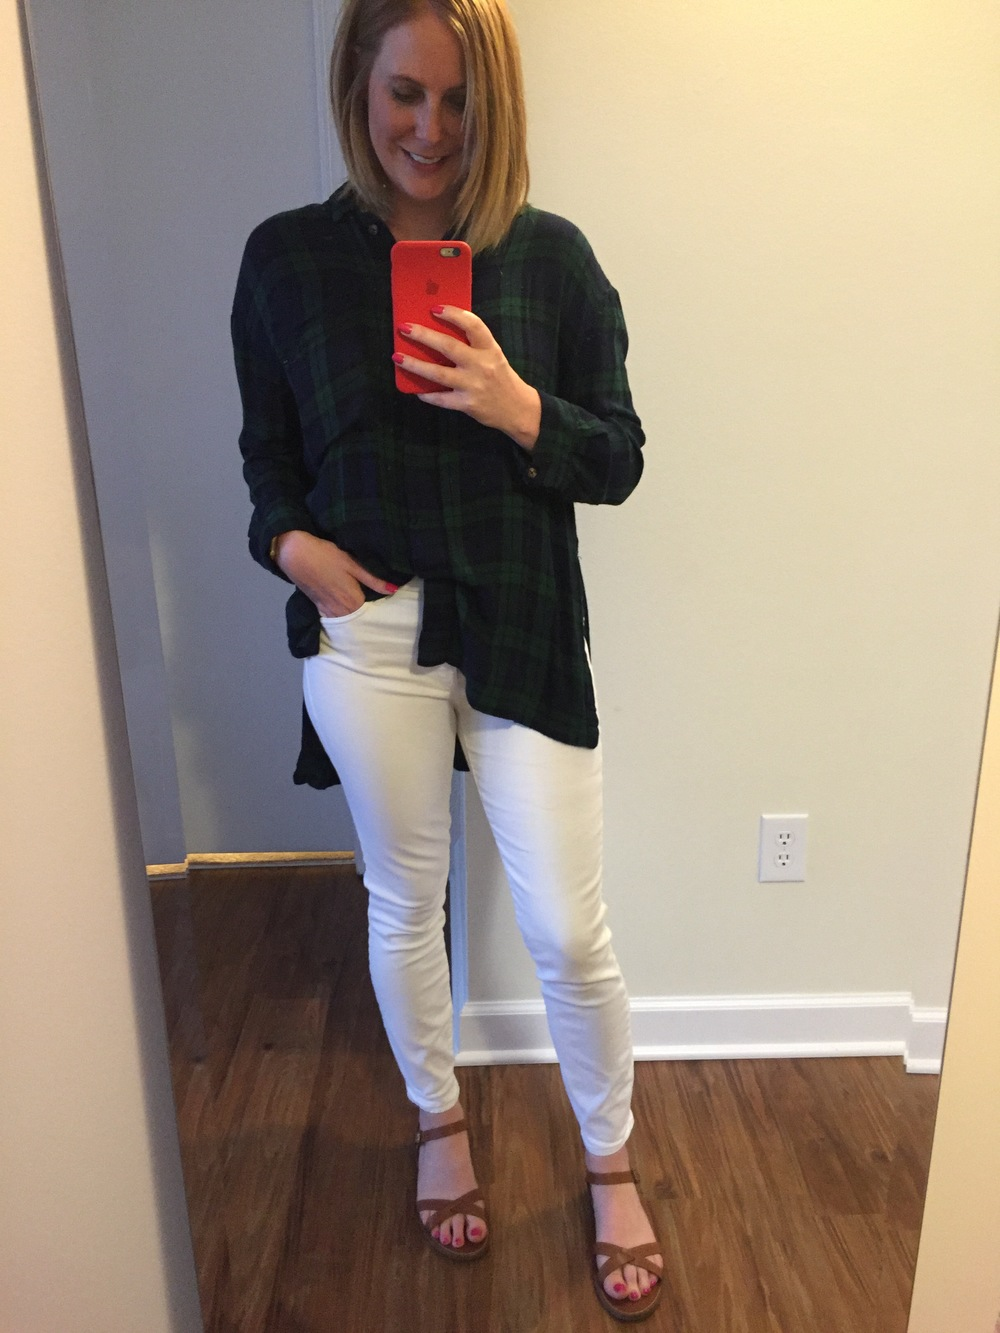 Top: Urban Outfitters,  BGD Logan Button-Down Shirt , Jeans: Gap,  STRETCH 1969 true skinny high rise jeans , Sandals: Madewell,  boardwalk crisscross sandals